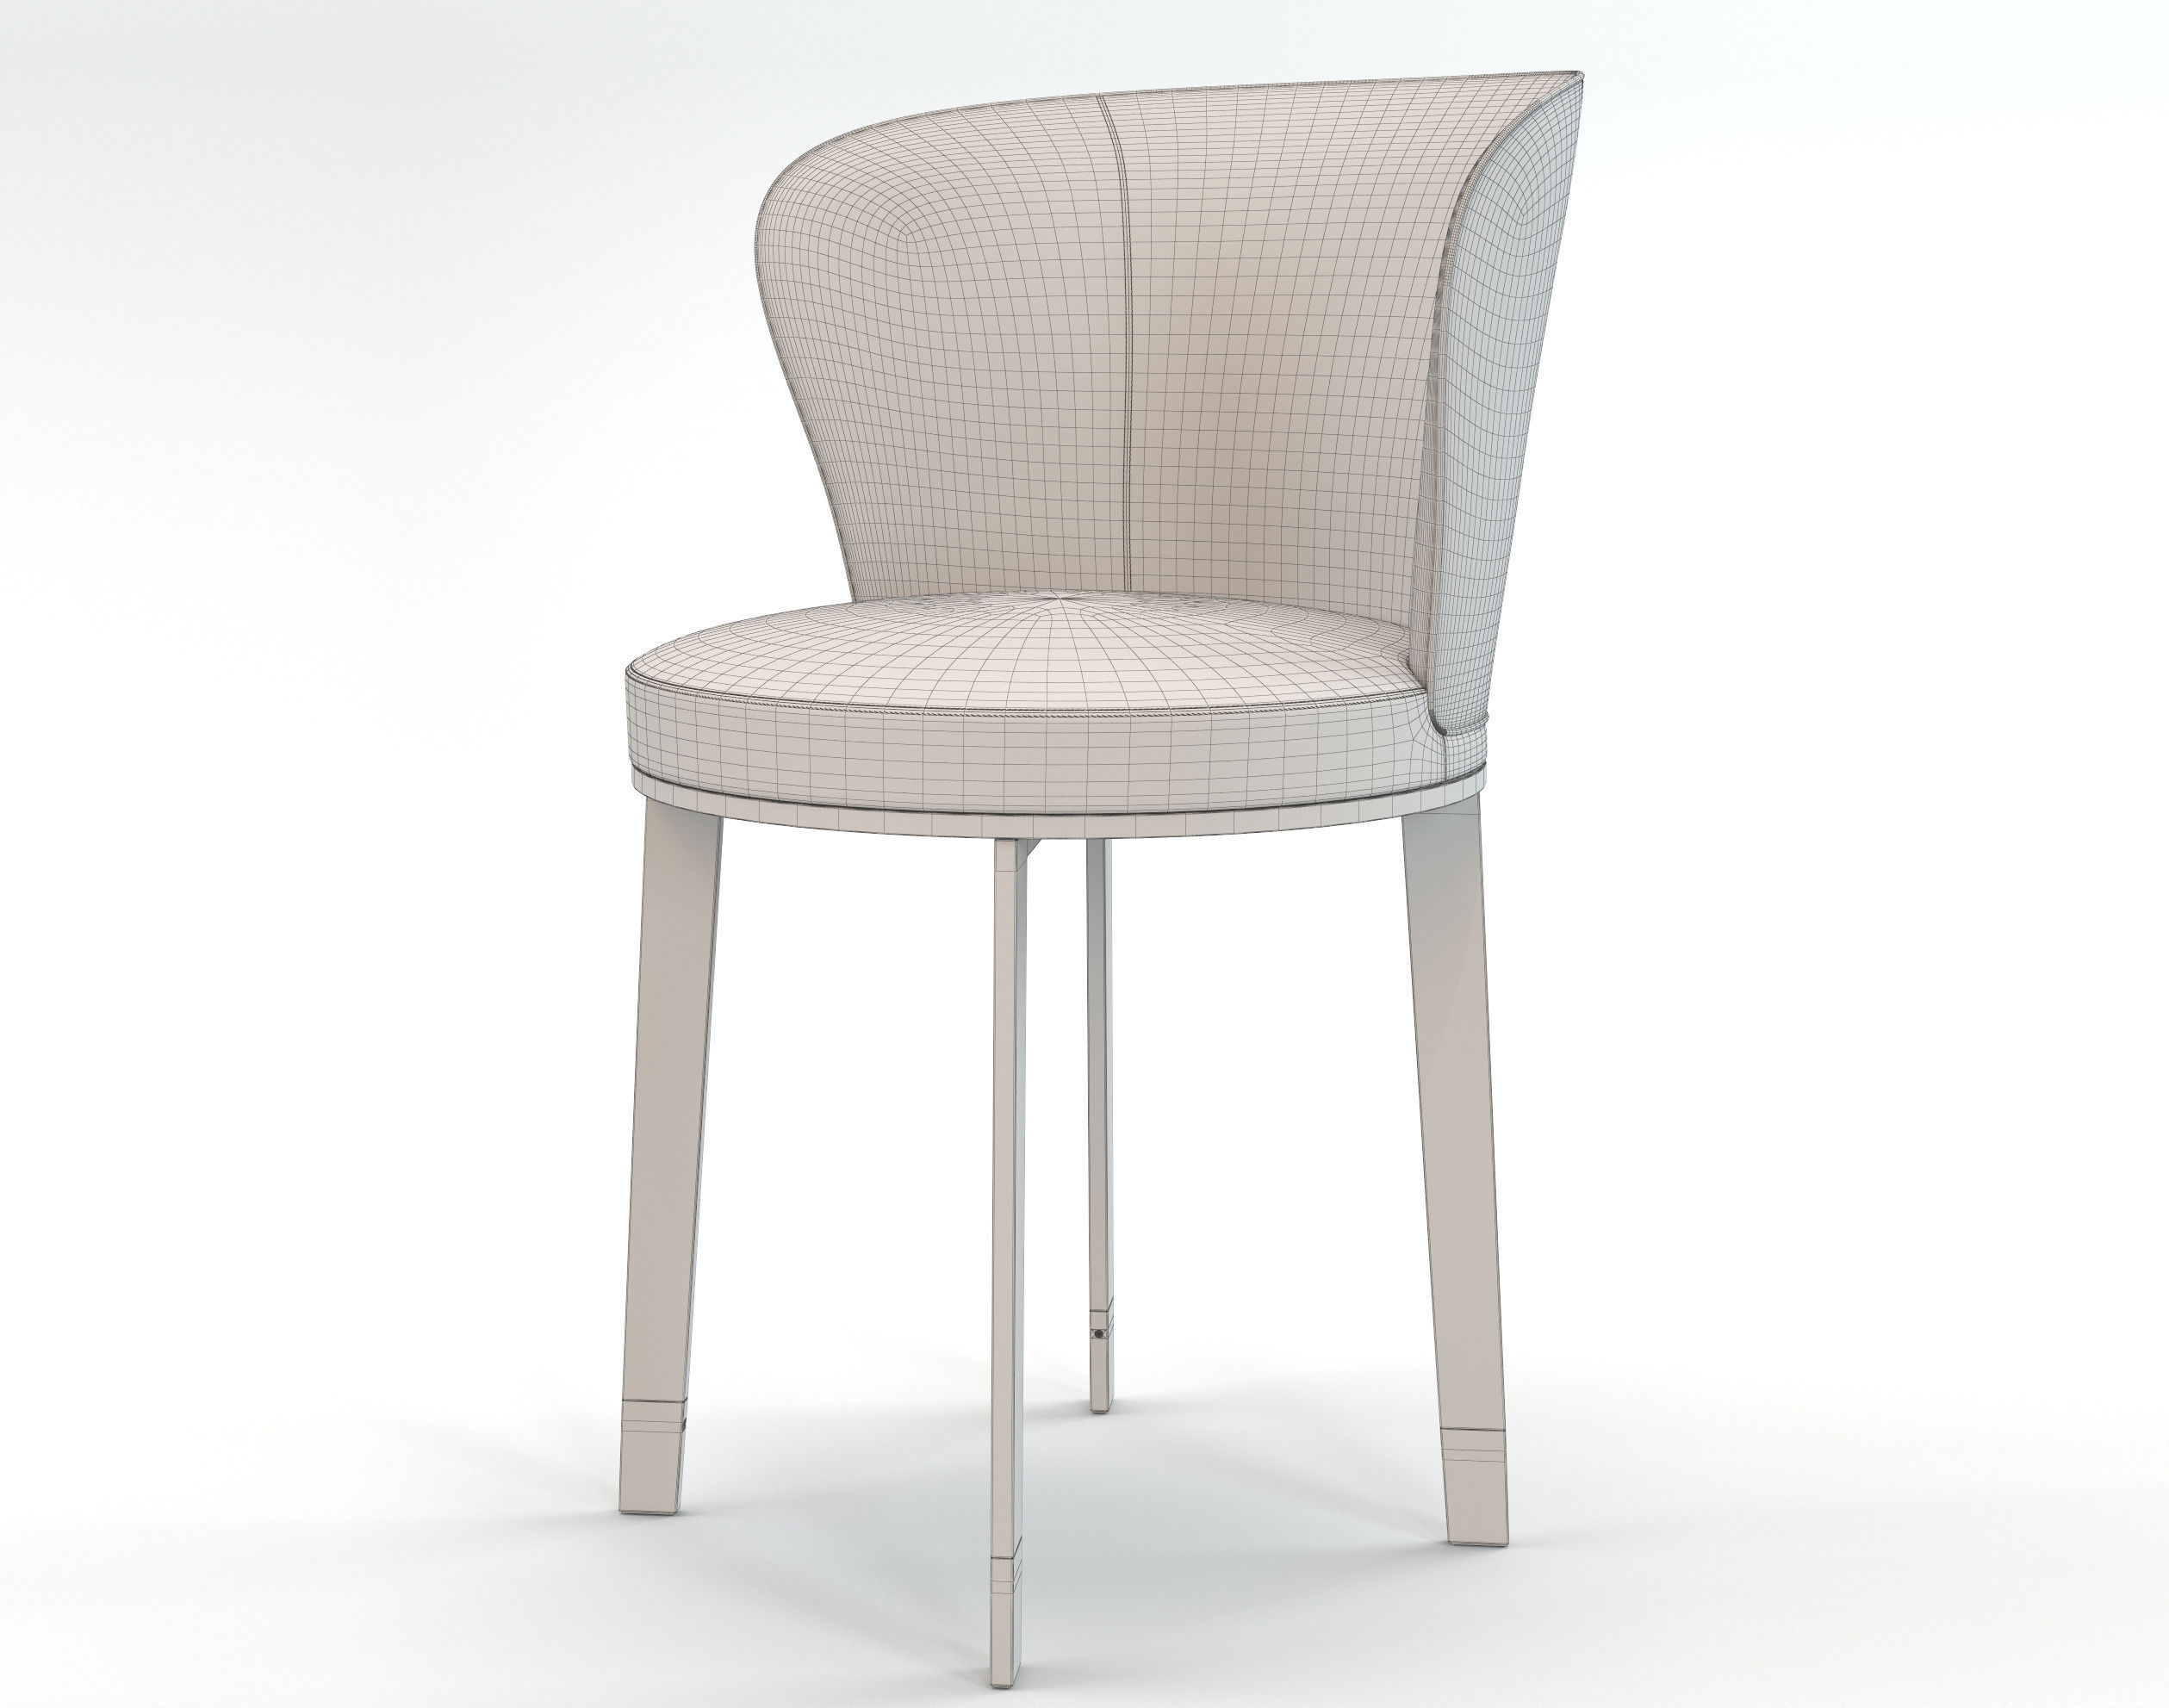 Giorgetti Ode Modern Chair 3D Model MAX OBJ FBX CGTradercom : giorgettiodemodernchair3dmodelfbxobjmaxe9adbd0b ba2d 46ea b270 64ece4c4f730 from www.cgtrader.com size 2518 x 1983 jpeg 275kB